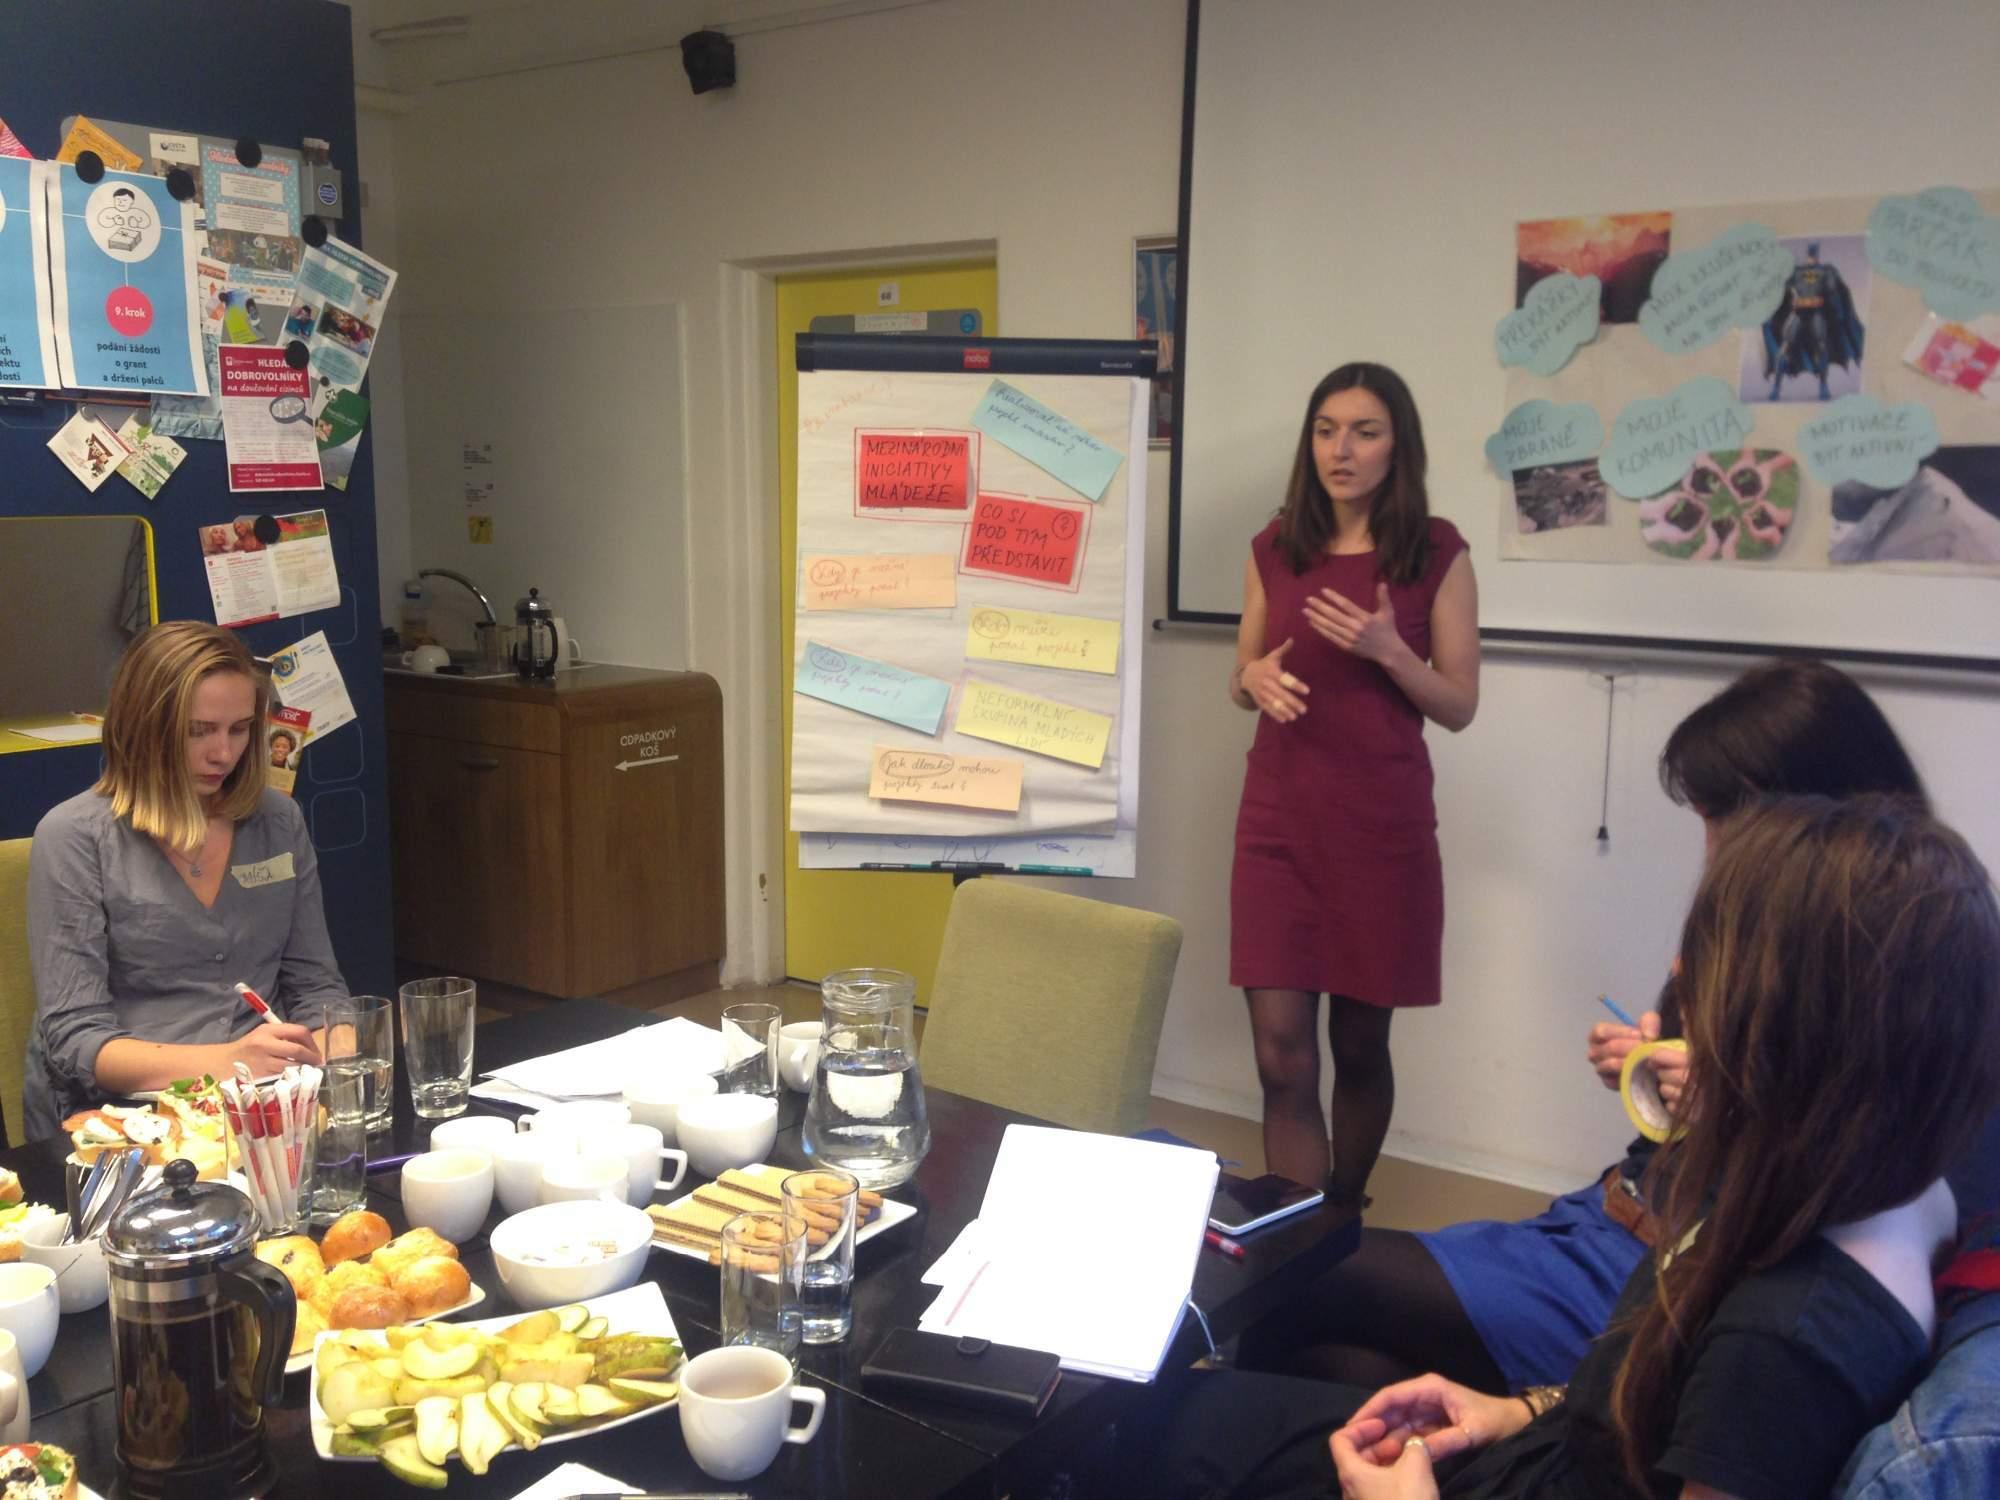 Odborná referentka programu Erasmus+ mládež a zároveň vedoucí workshopu Markéta Konečná. Foto: Eliška Pospíšilová